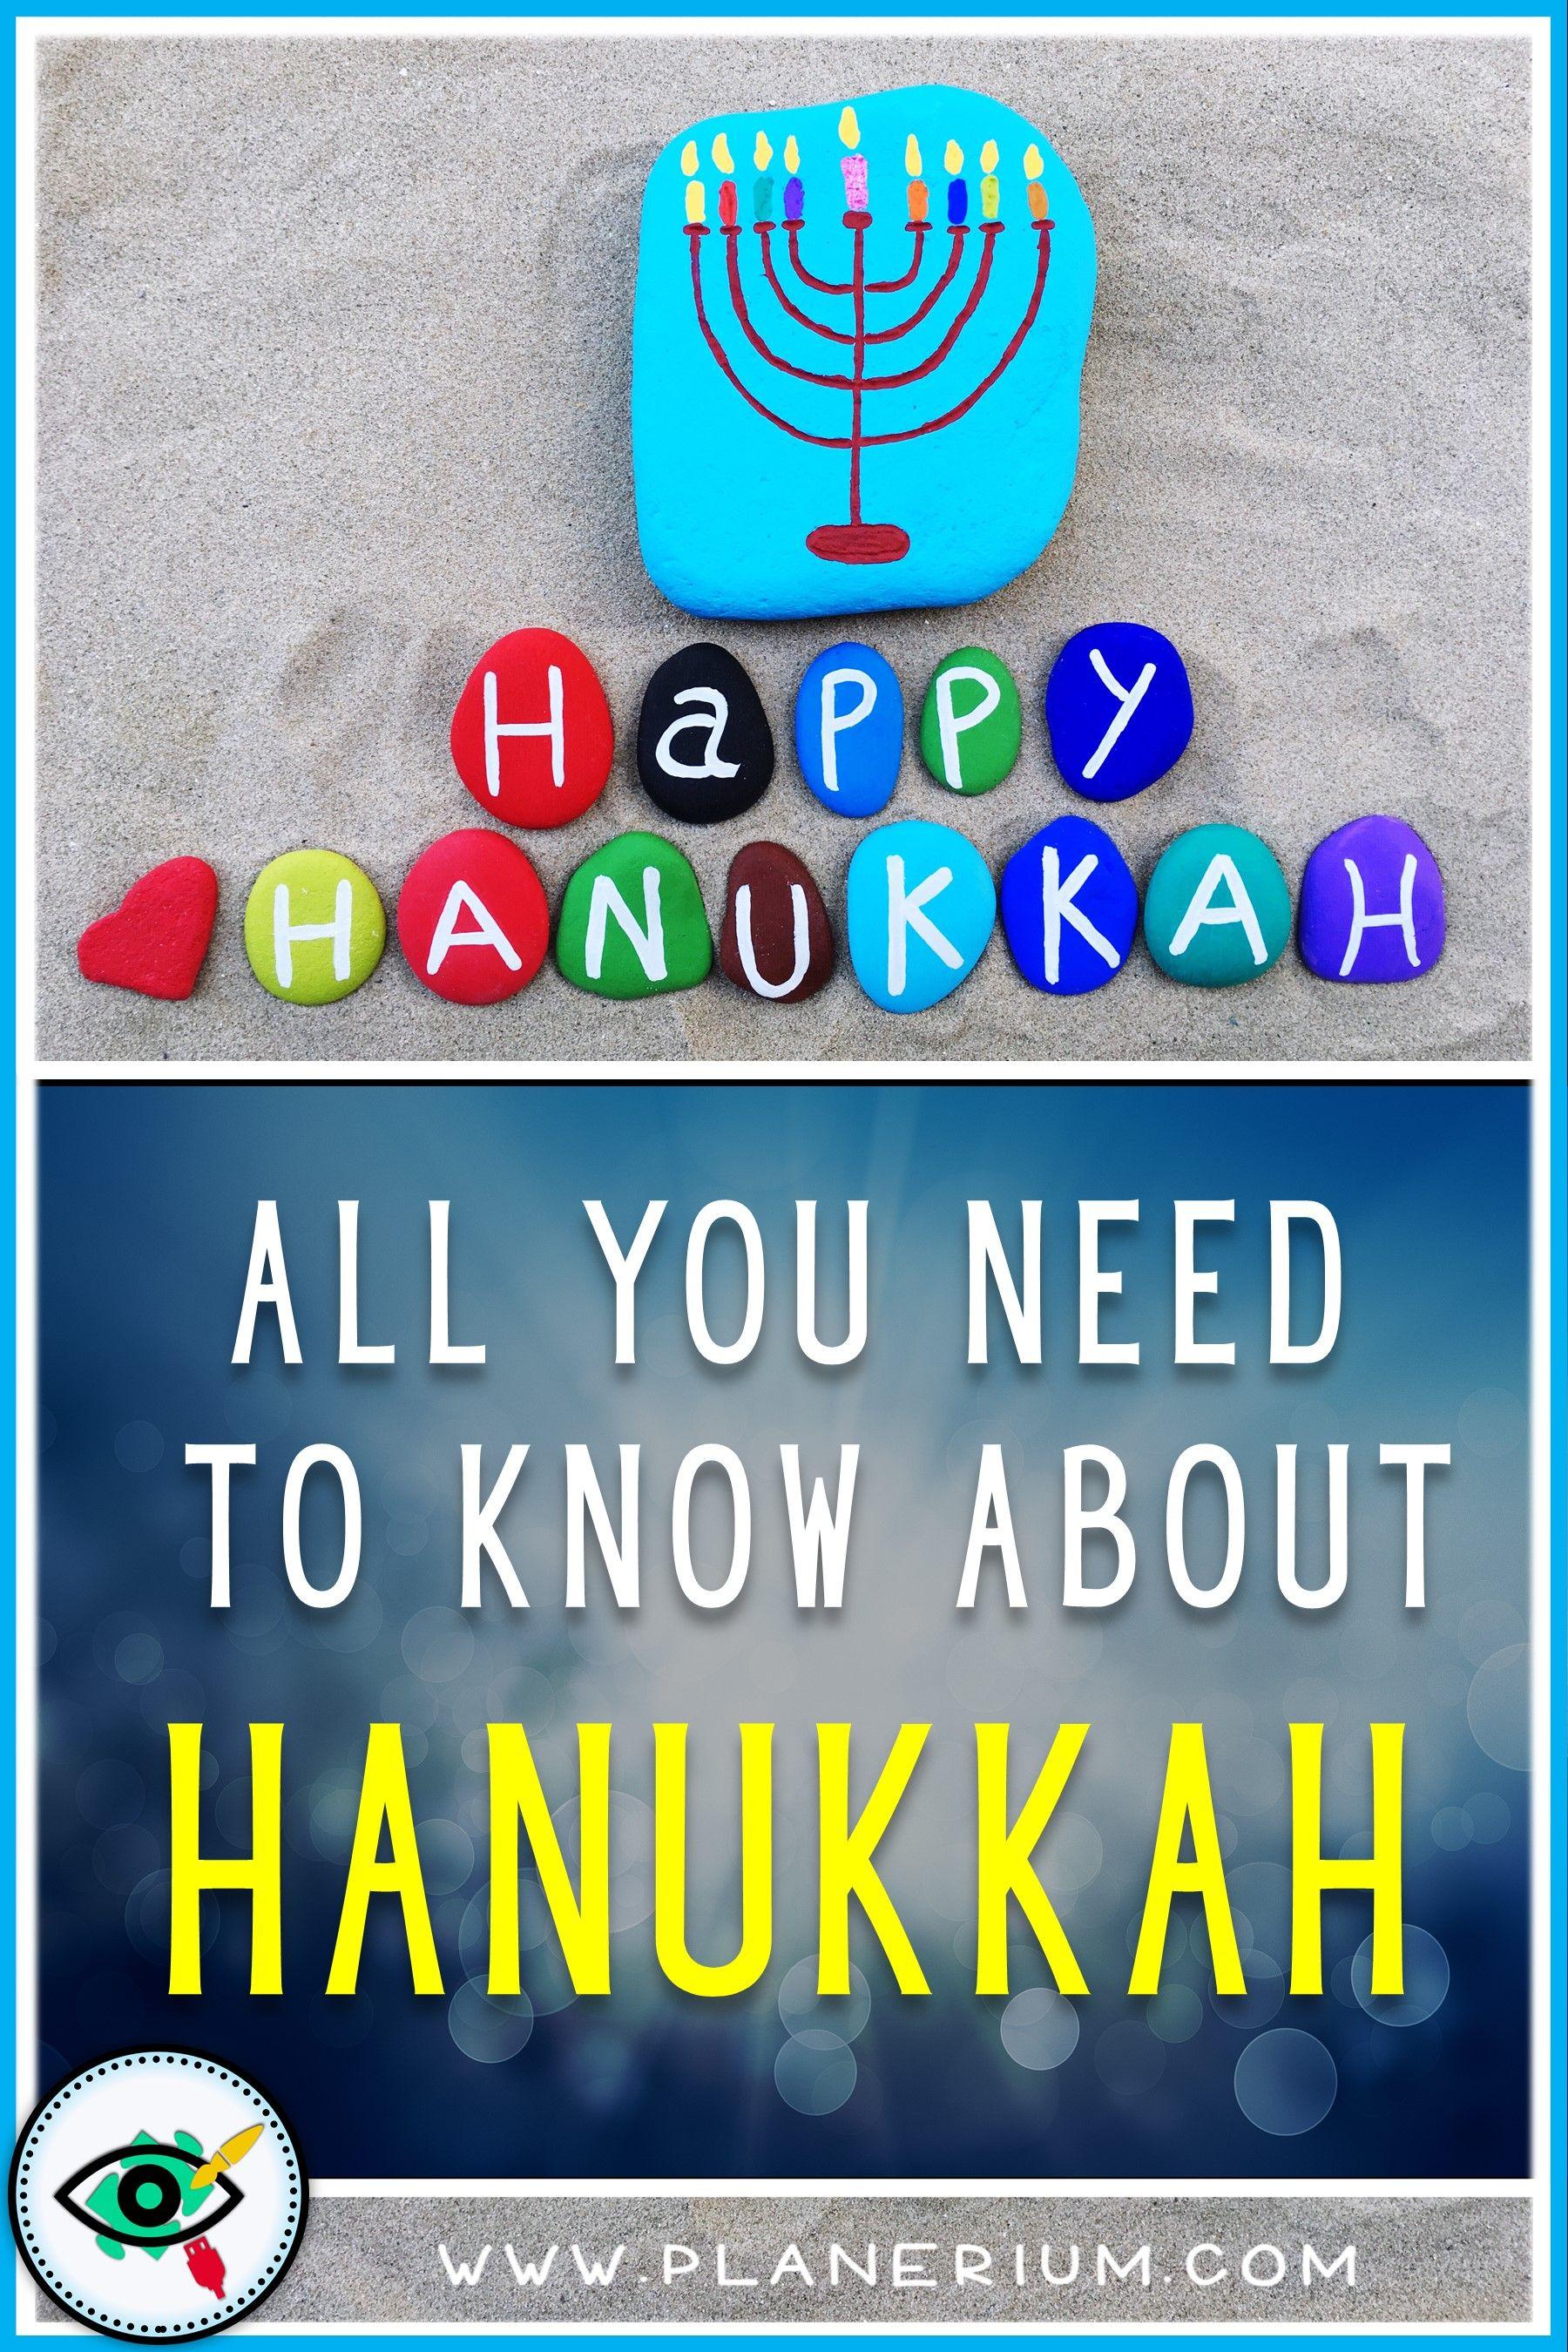 Best Teaching Resources For Hanukkah 2021 Planerium Hanukkah Hanukkah Kids Activities Jewish Education [ 2700 x 1800 Pixel ]